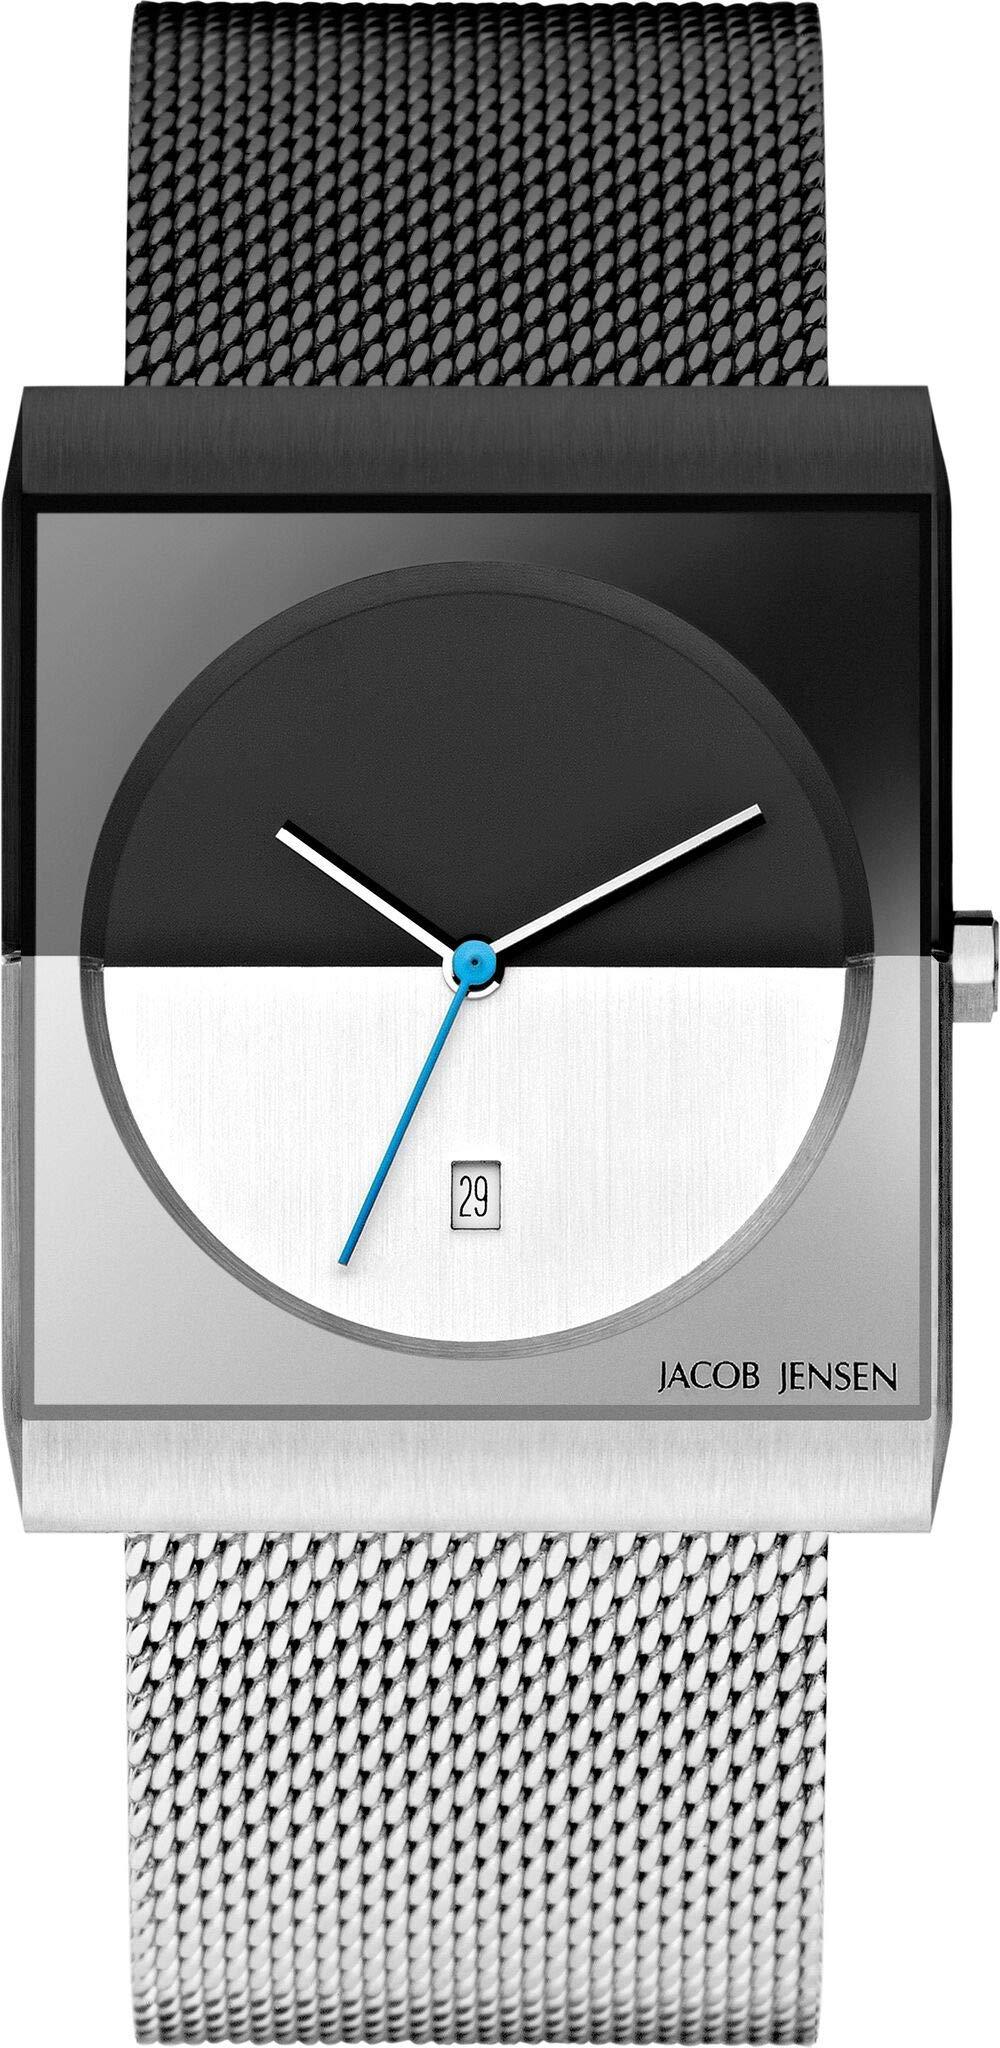 Jacob Jensen Reloj Analógico para Hombre de Cuarzo con Correa en Acero